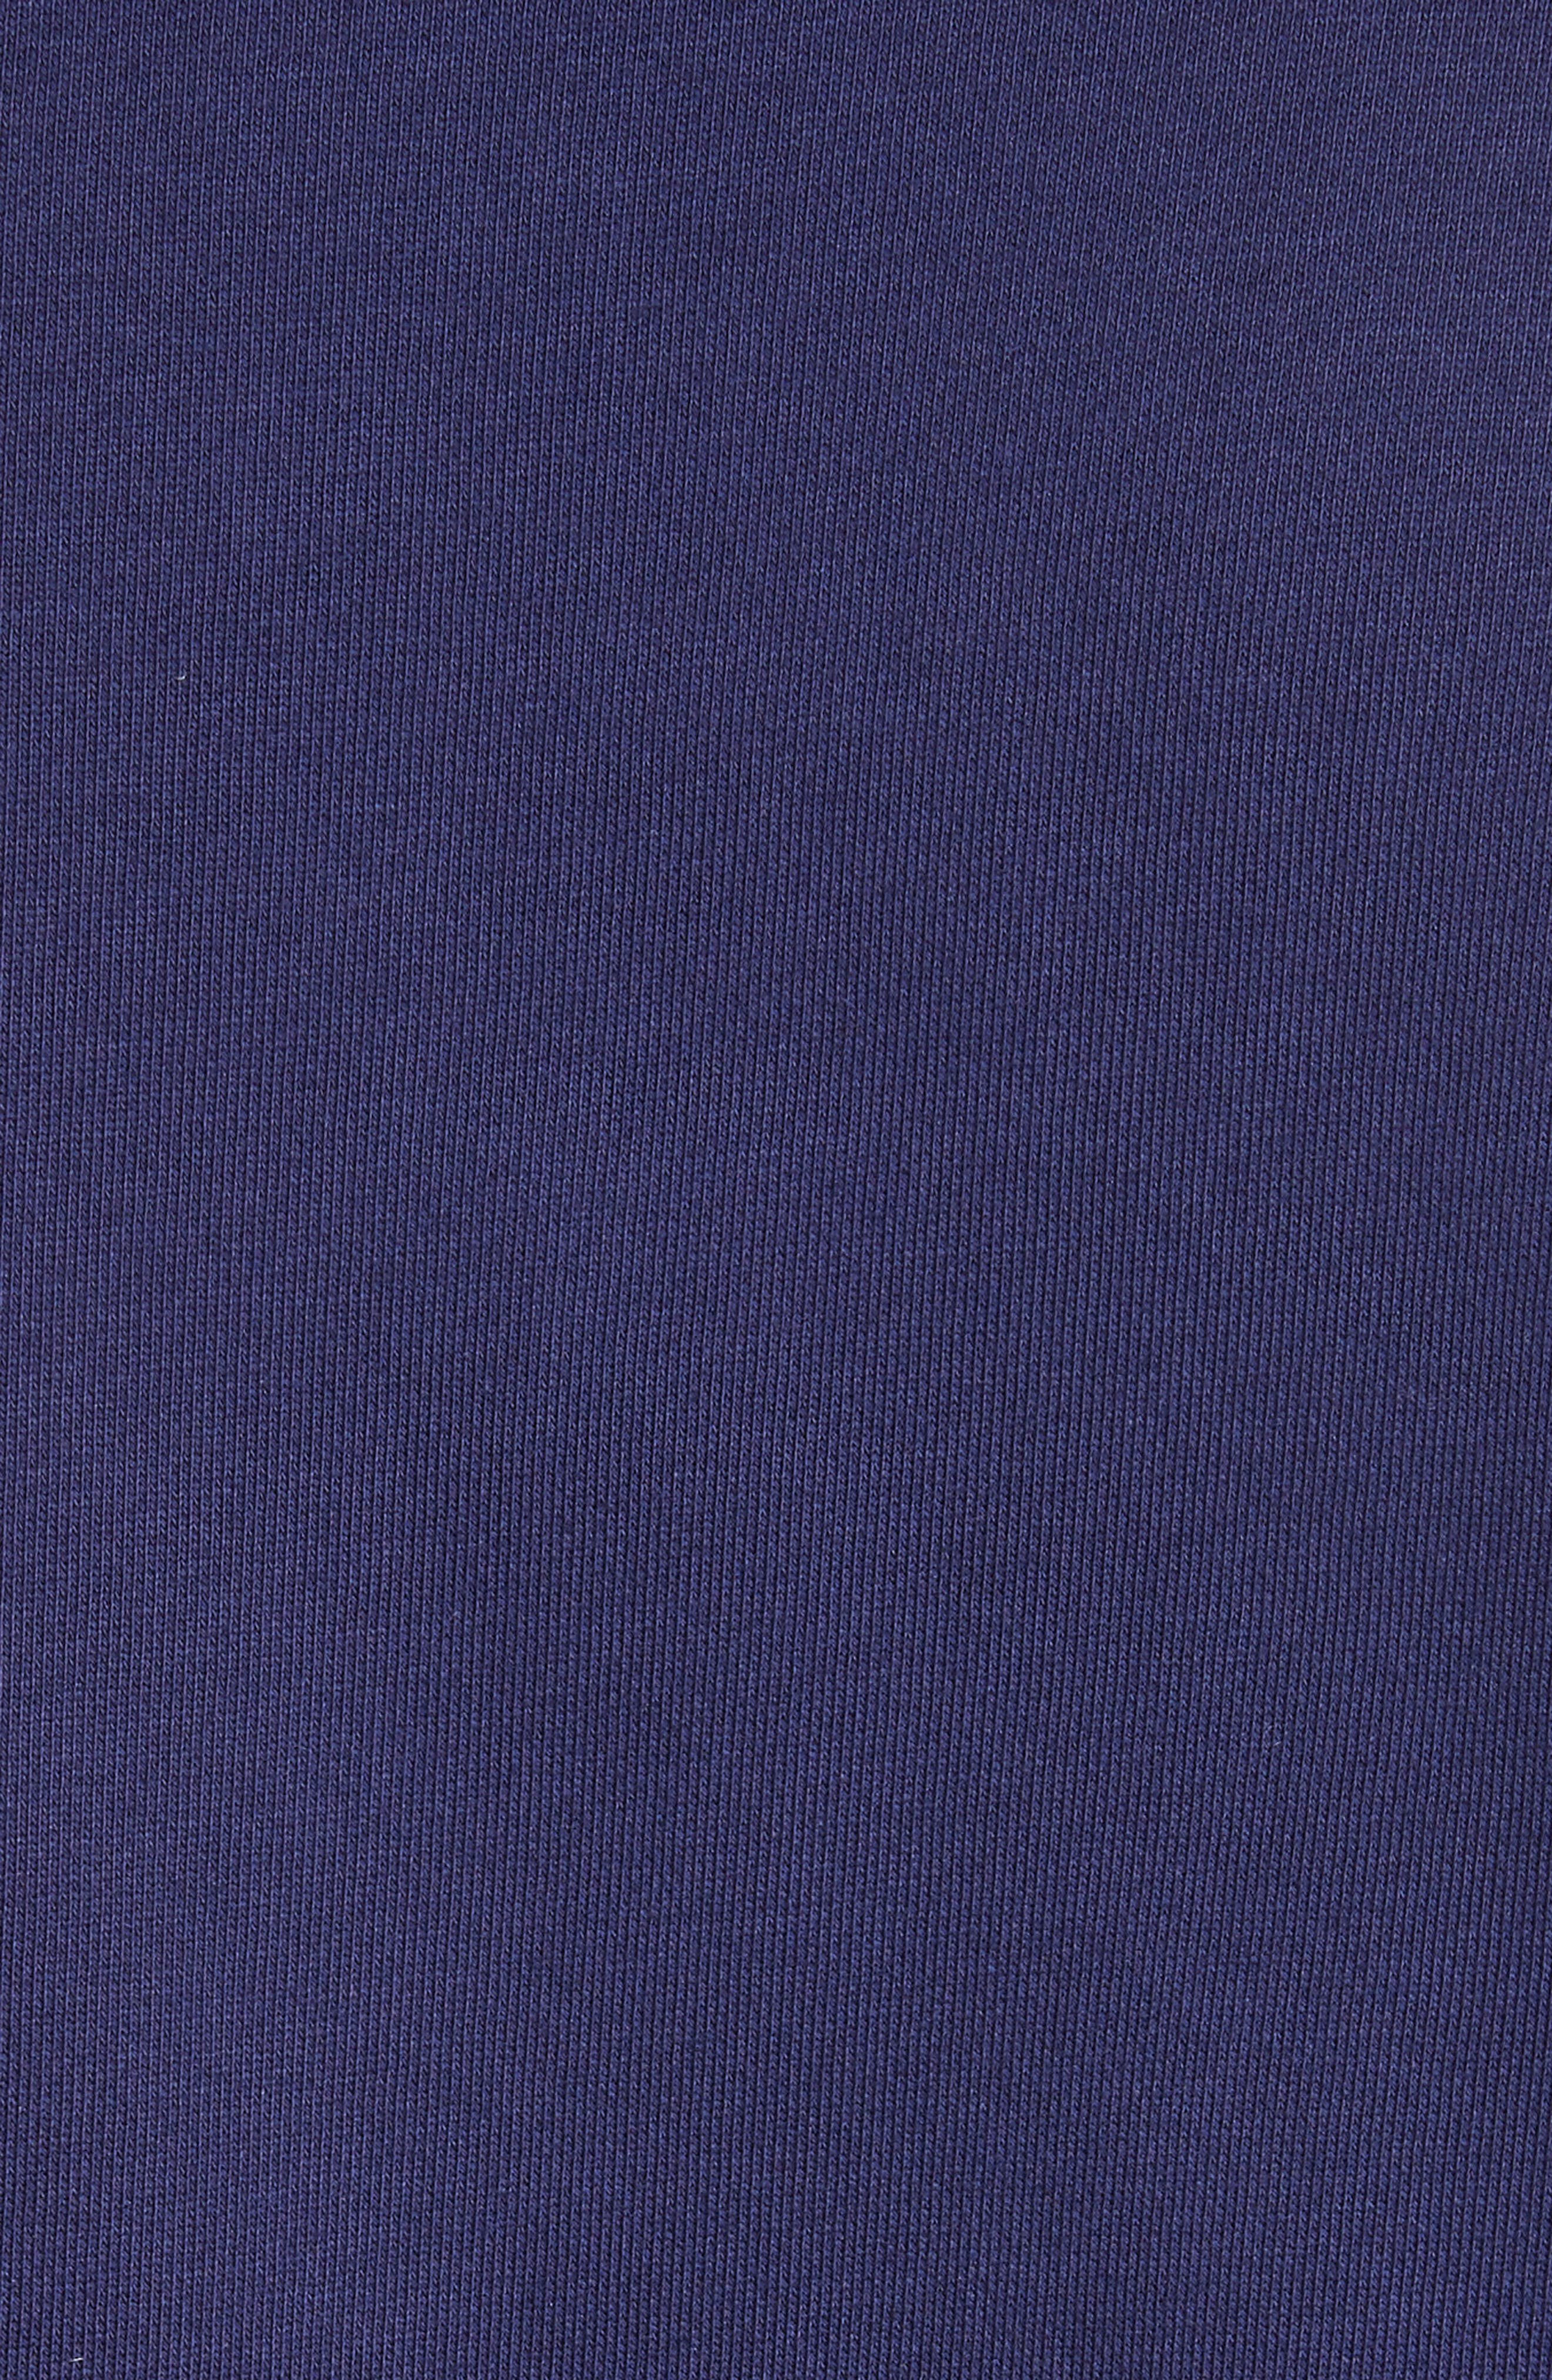 Maglia Mixed Media Down Knit Jacket,                             Alternate thumbnail 6, color,